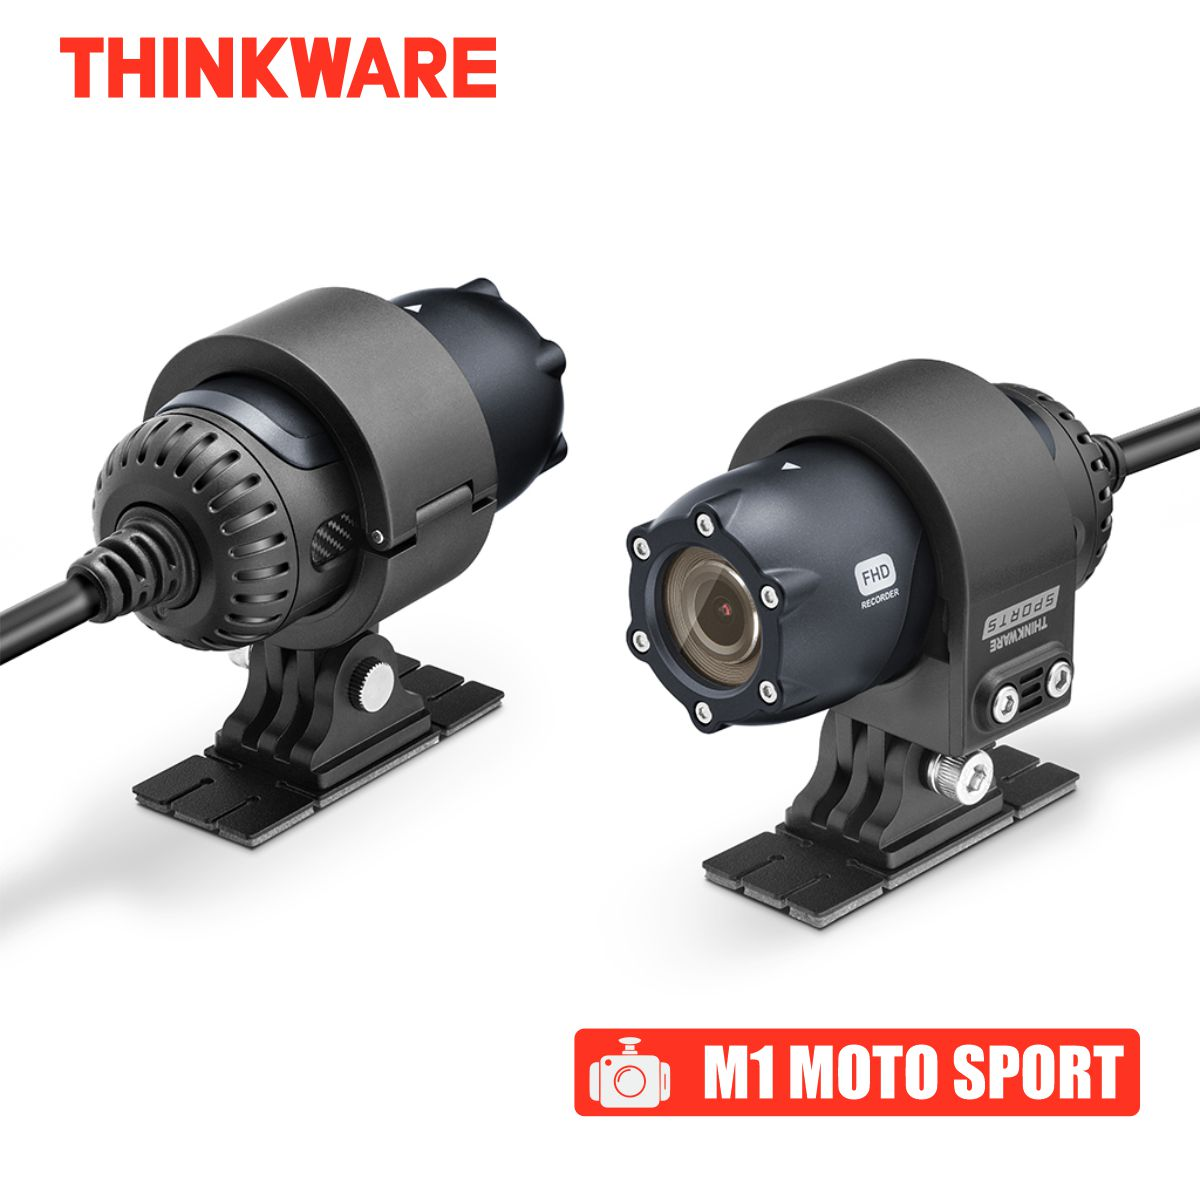 THINKWARE Dash Cam M1 Moto Sport